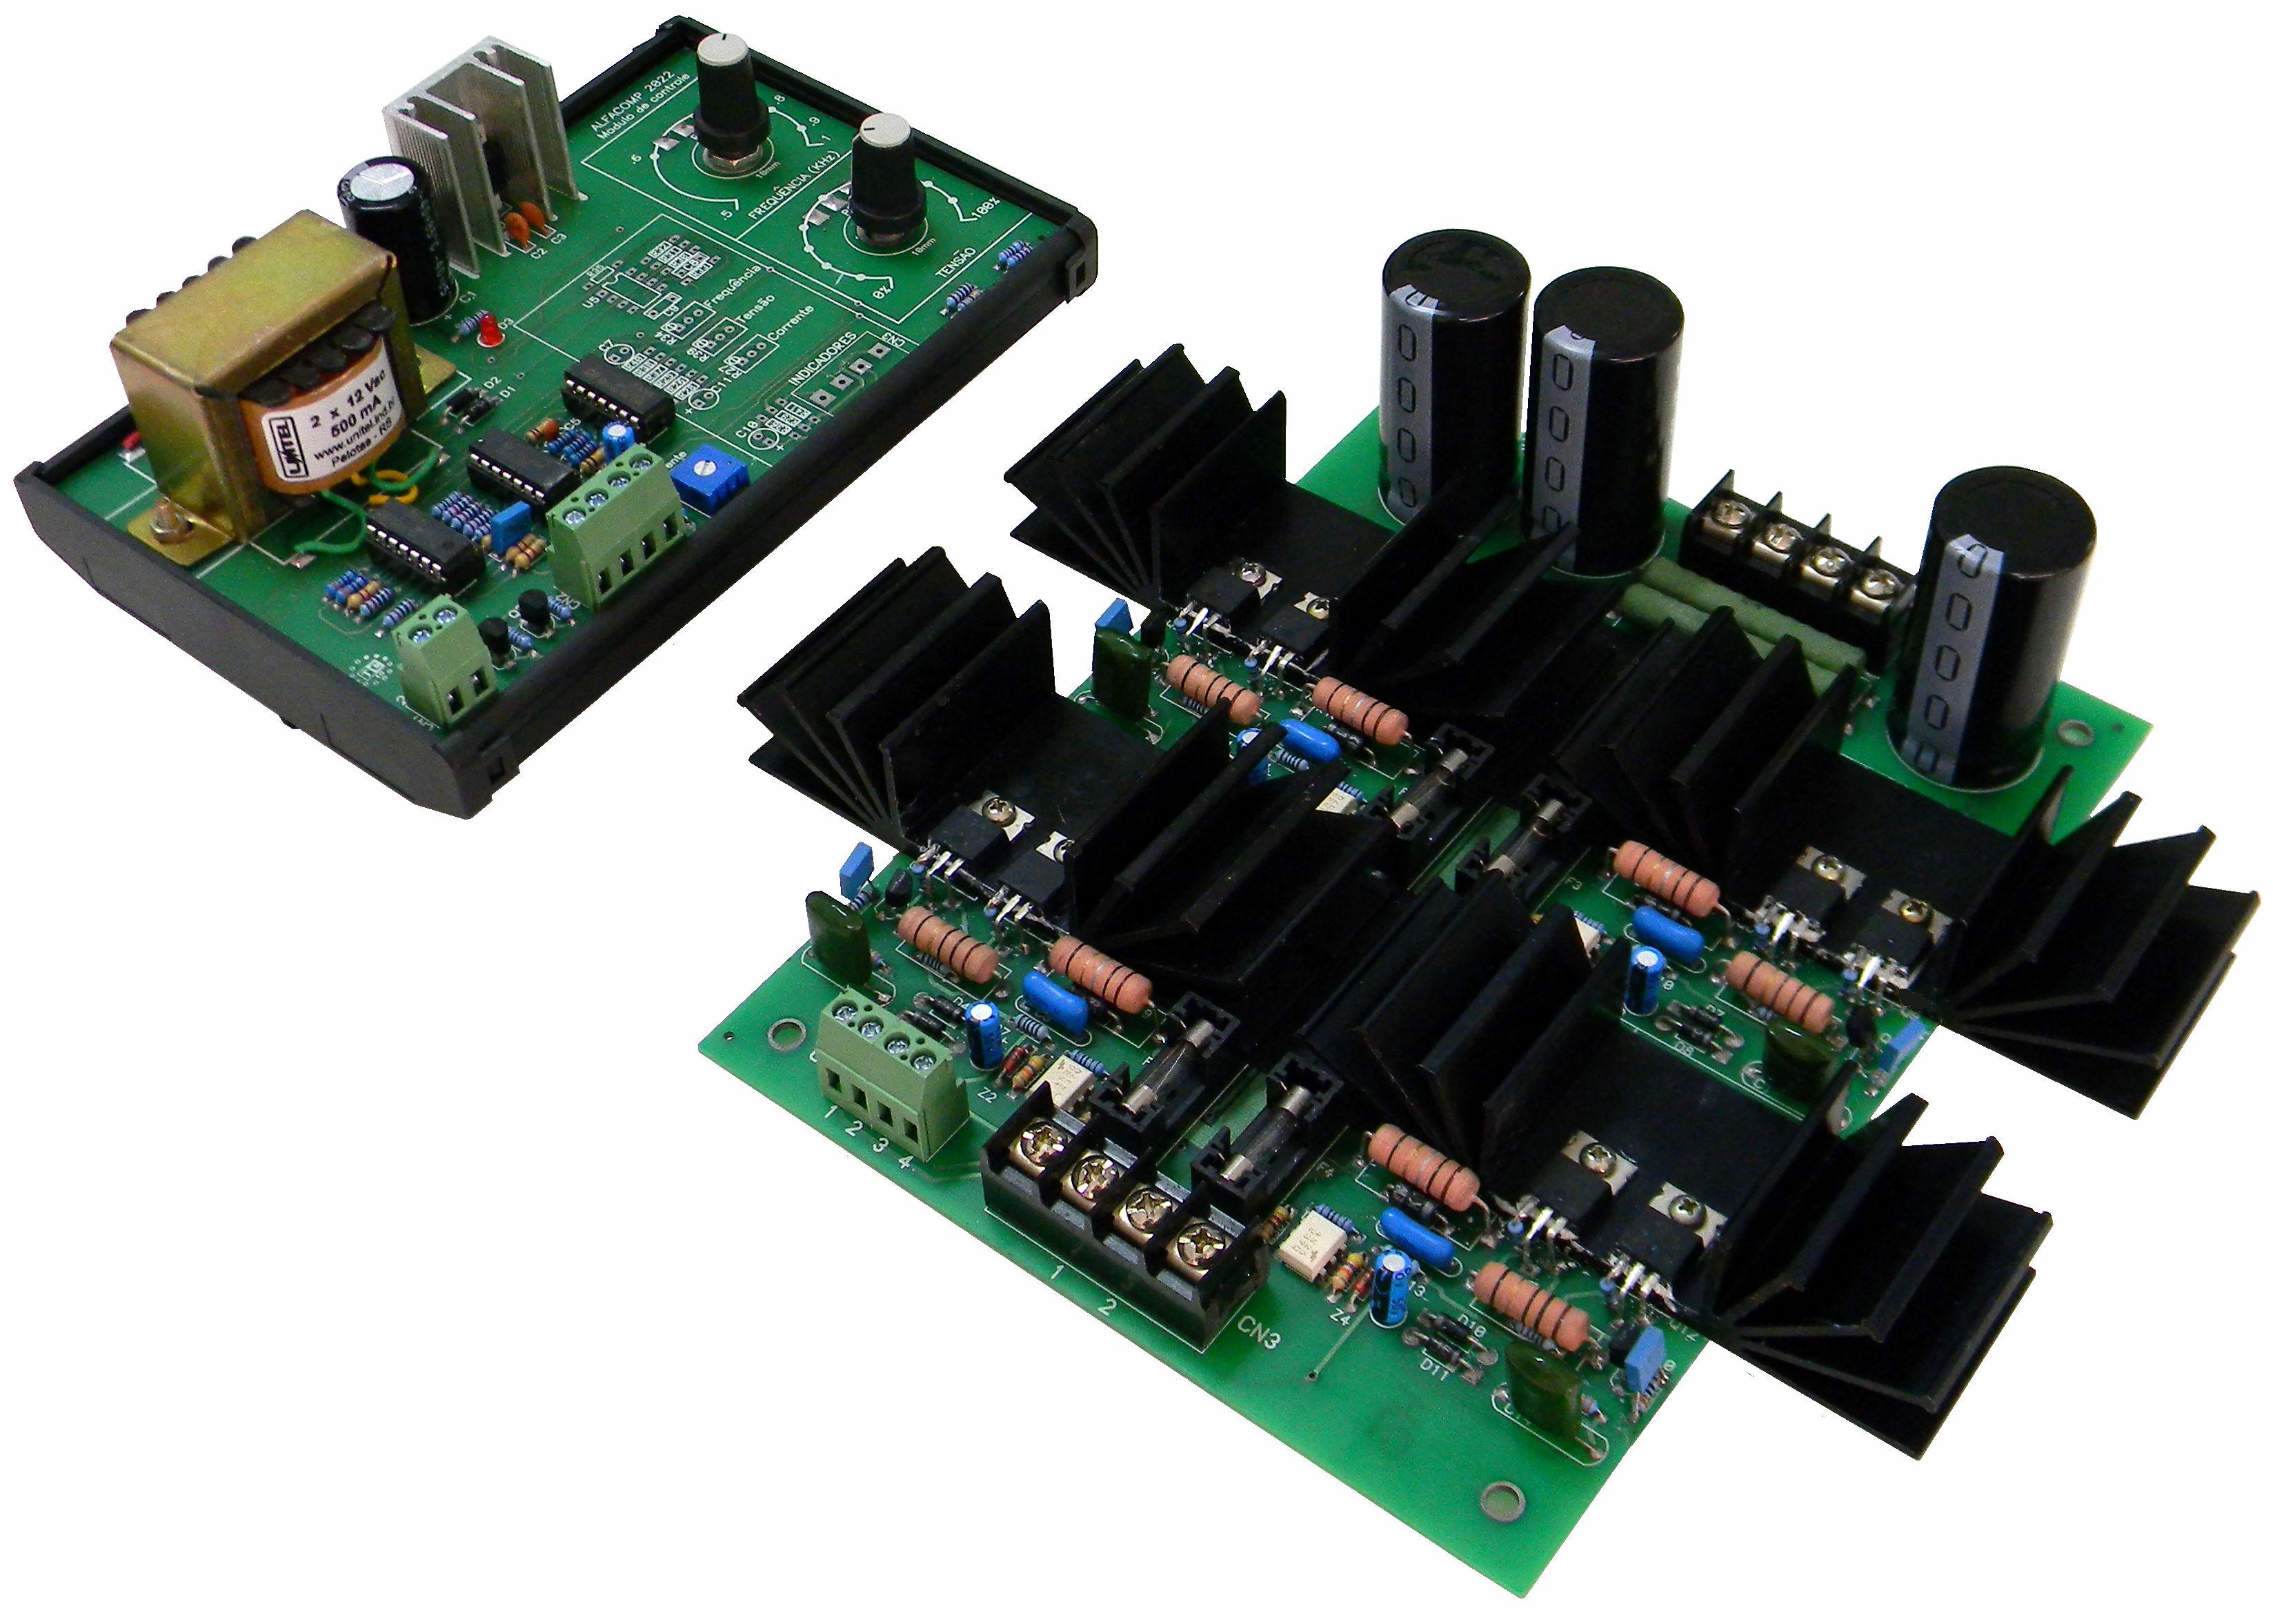 Insensibilizador eletrônico de suínos IE2002